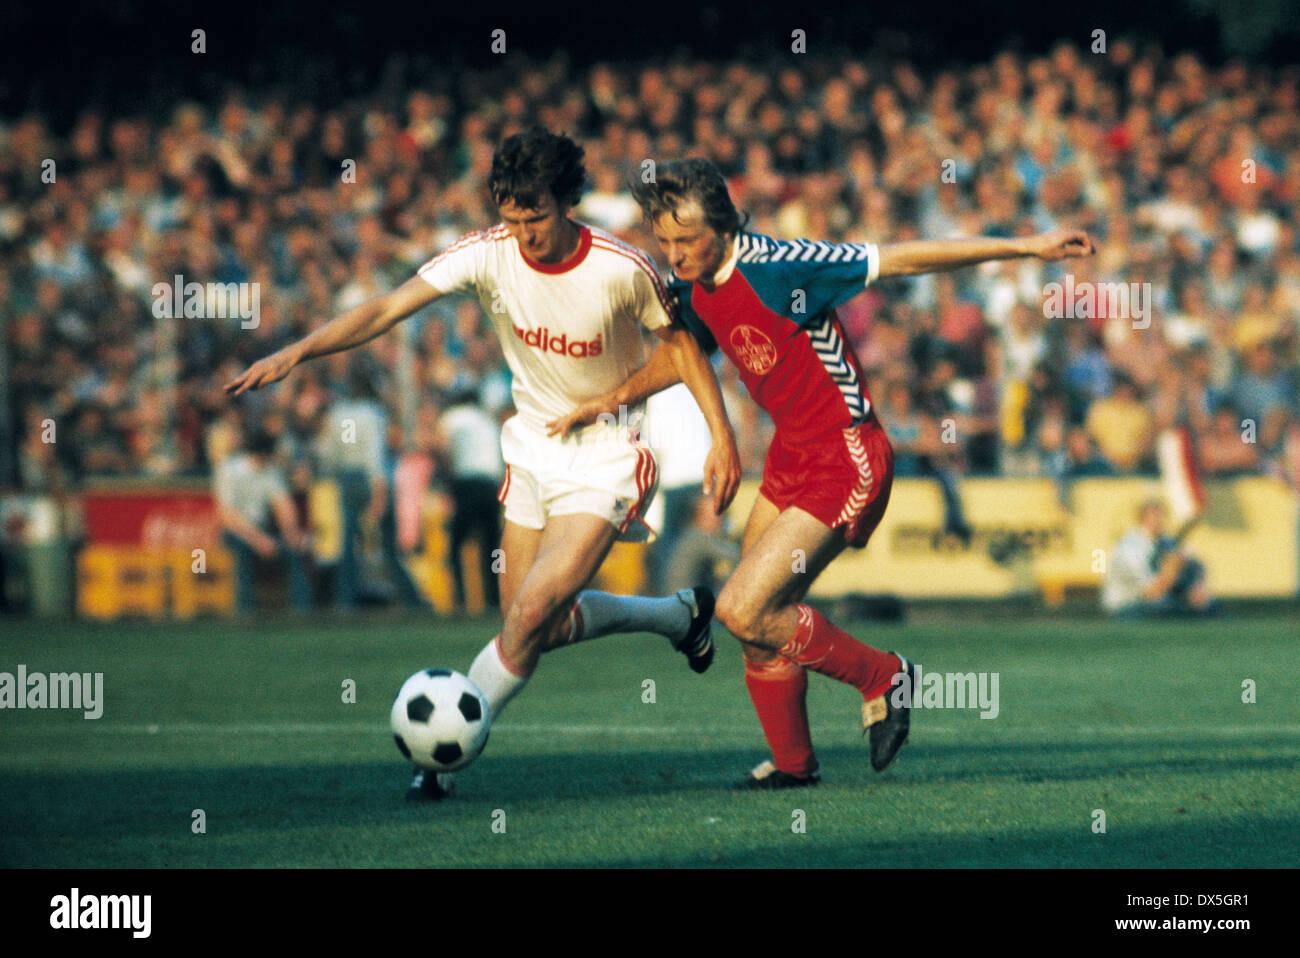 football, Bundesliga, 1975/1976, Grotenburg Stadium, FC Bayer 05 Uerdingen versus FC Bayern Munich 2:1, scene of the match, Klaus Wunder (FCB) left and Lorenz-Guenter Koestner (Uerdingen) - Stock Image